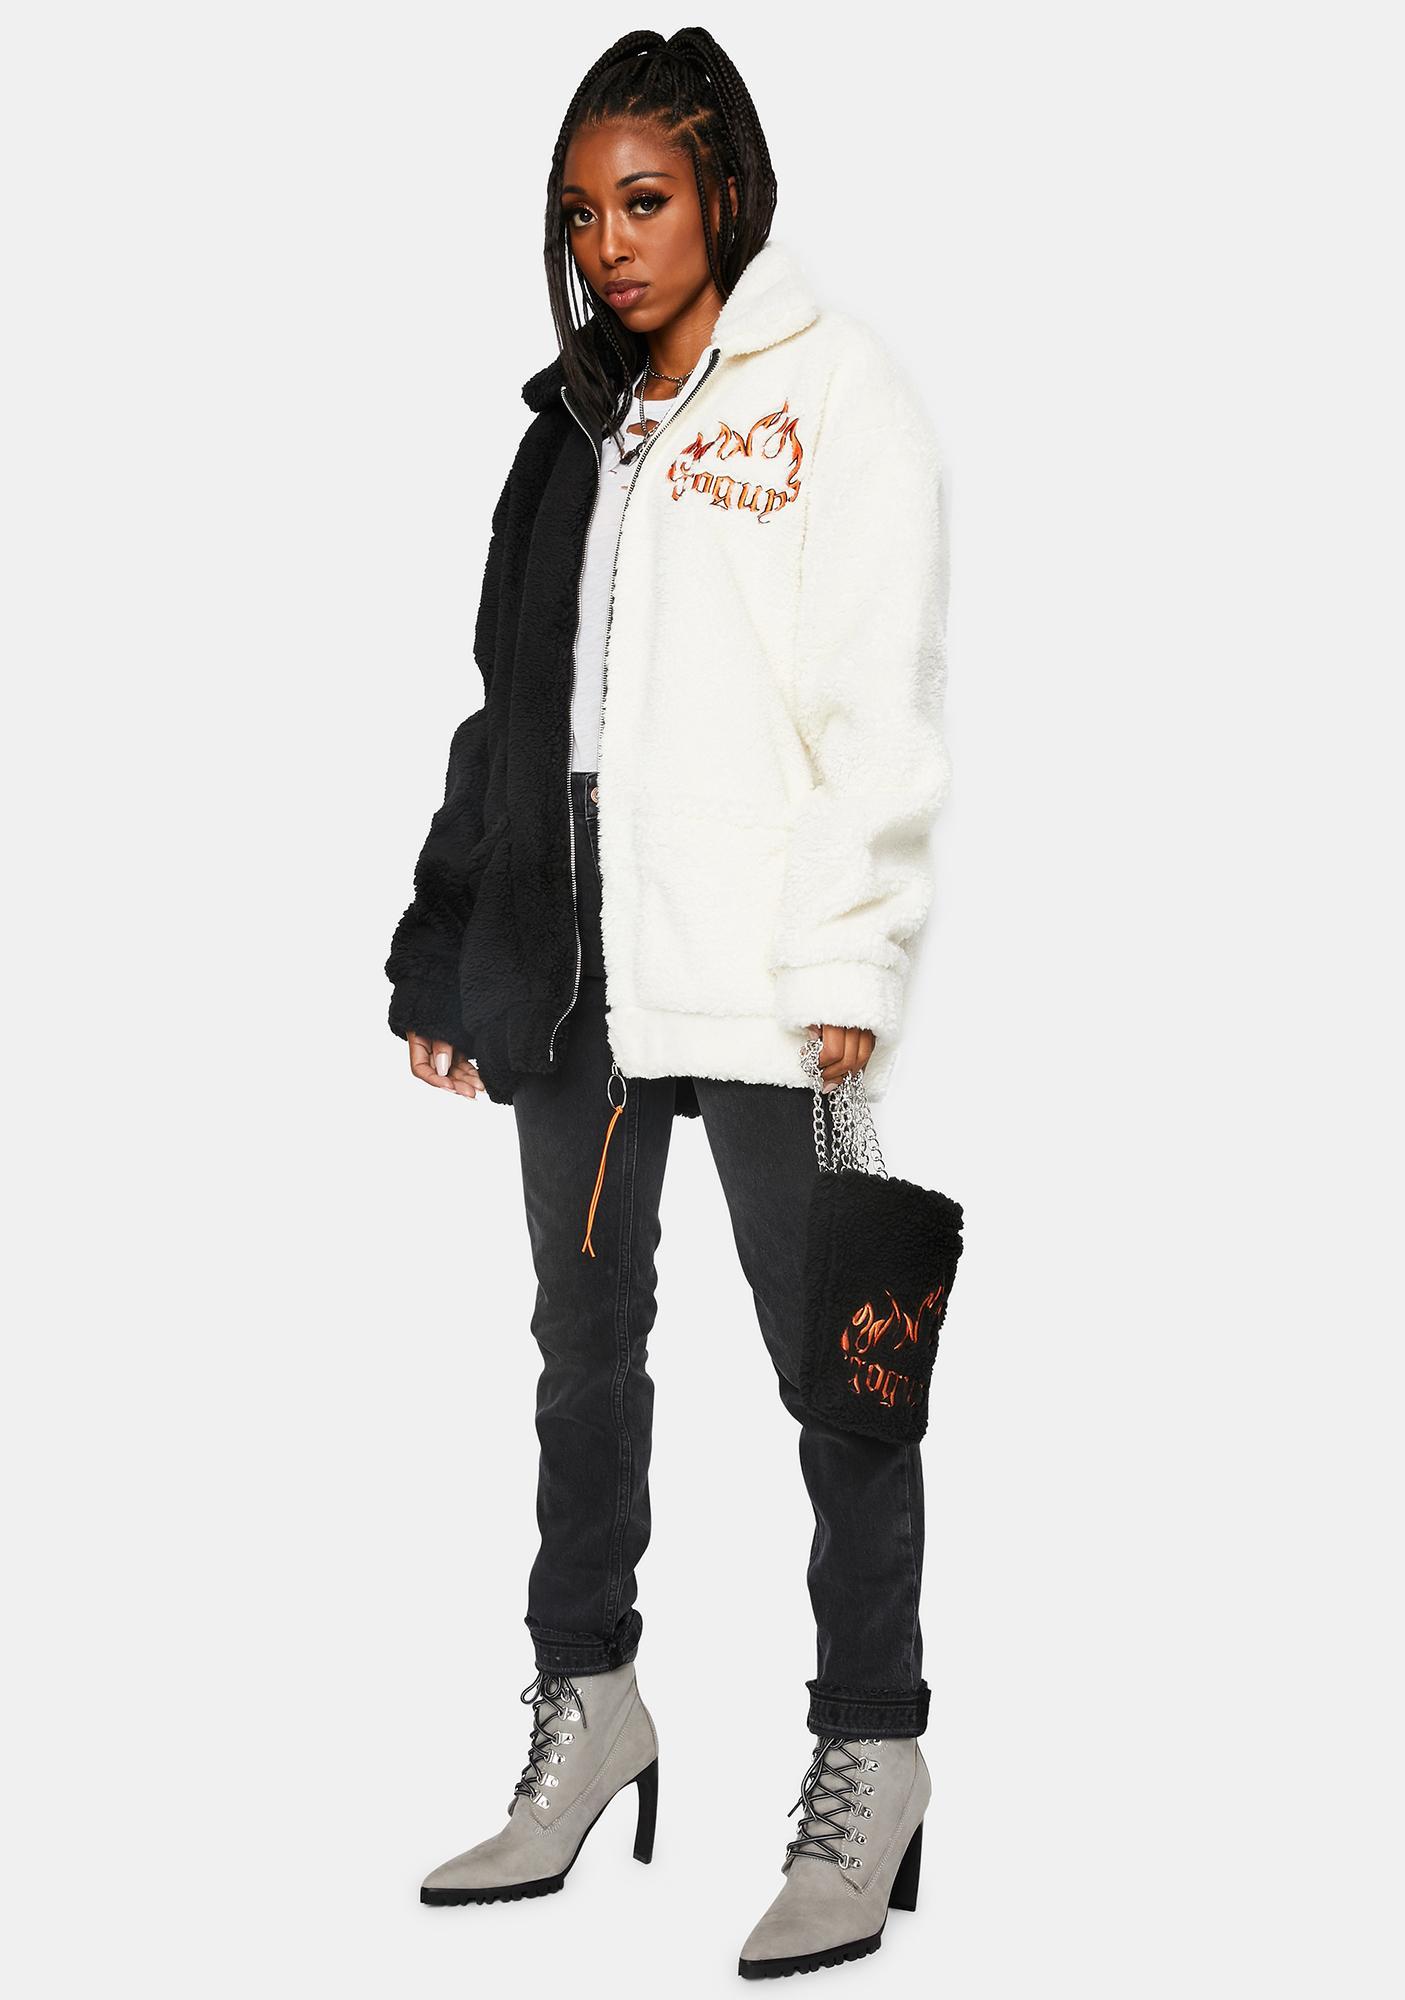 GoGuy Black & White Teddy Jacket And Bag Set